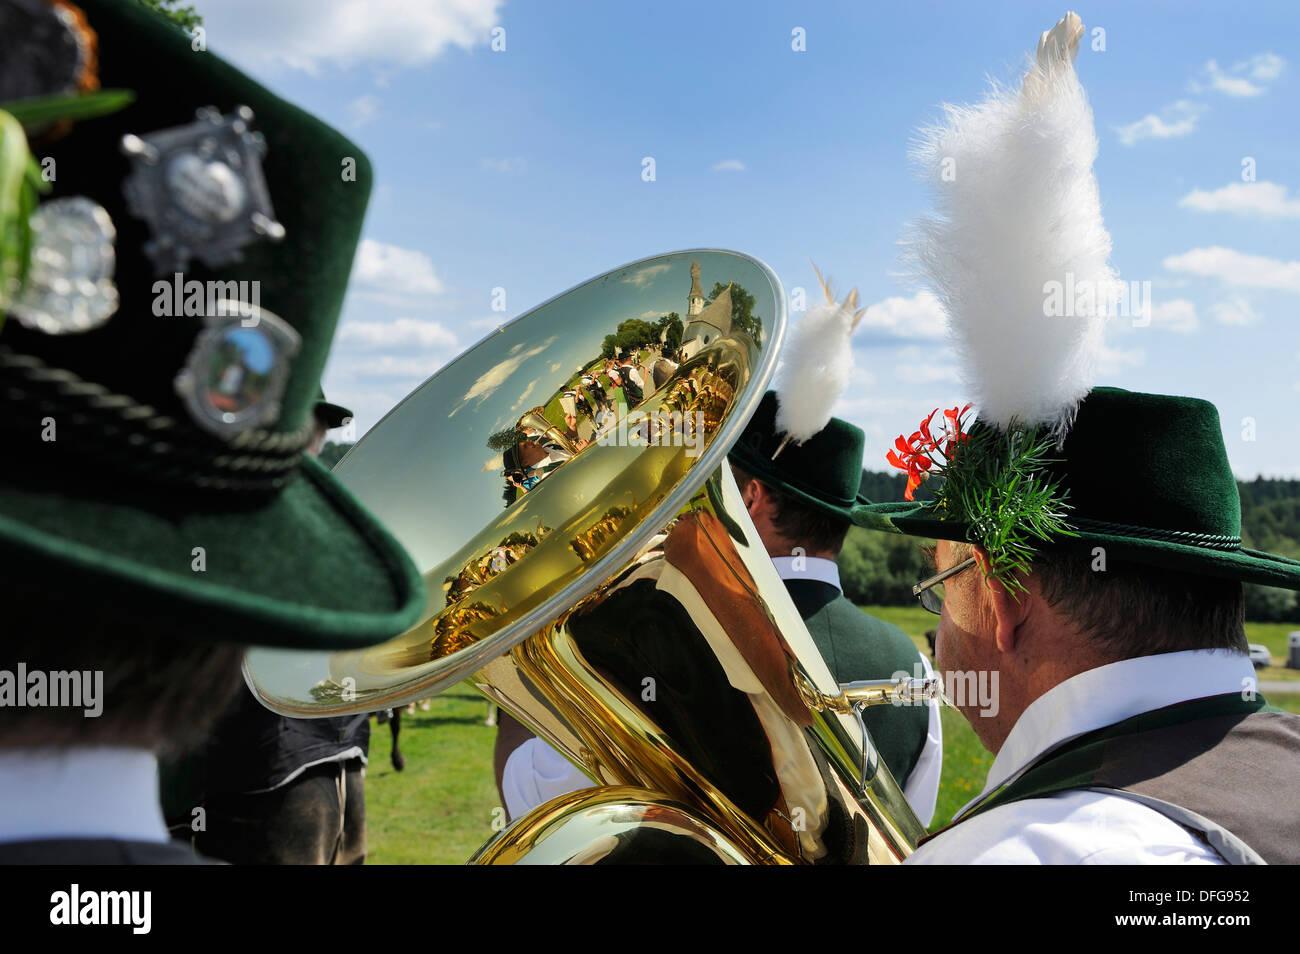 Marching band, Leonhardiritt procession, Harmating, Egling, Upper Bavaria, Bavaria, Germany Stock Photo